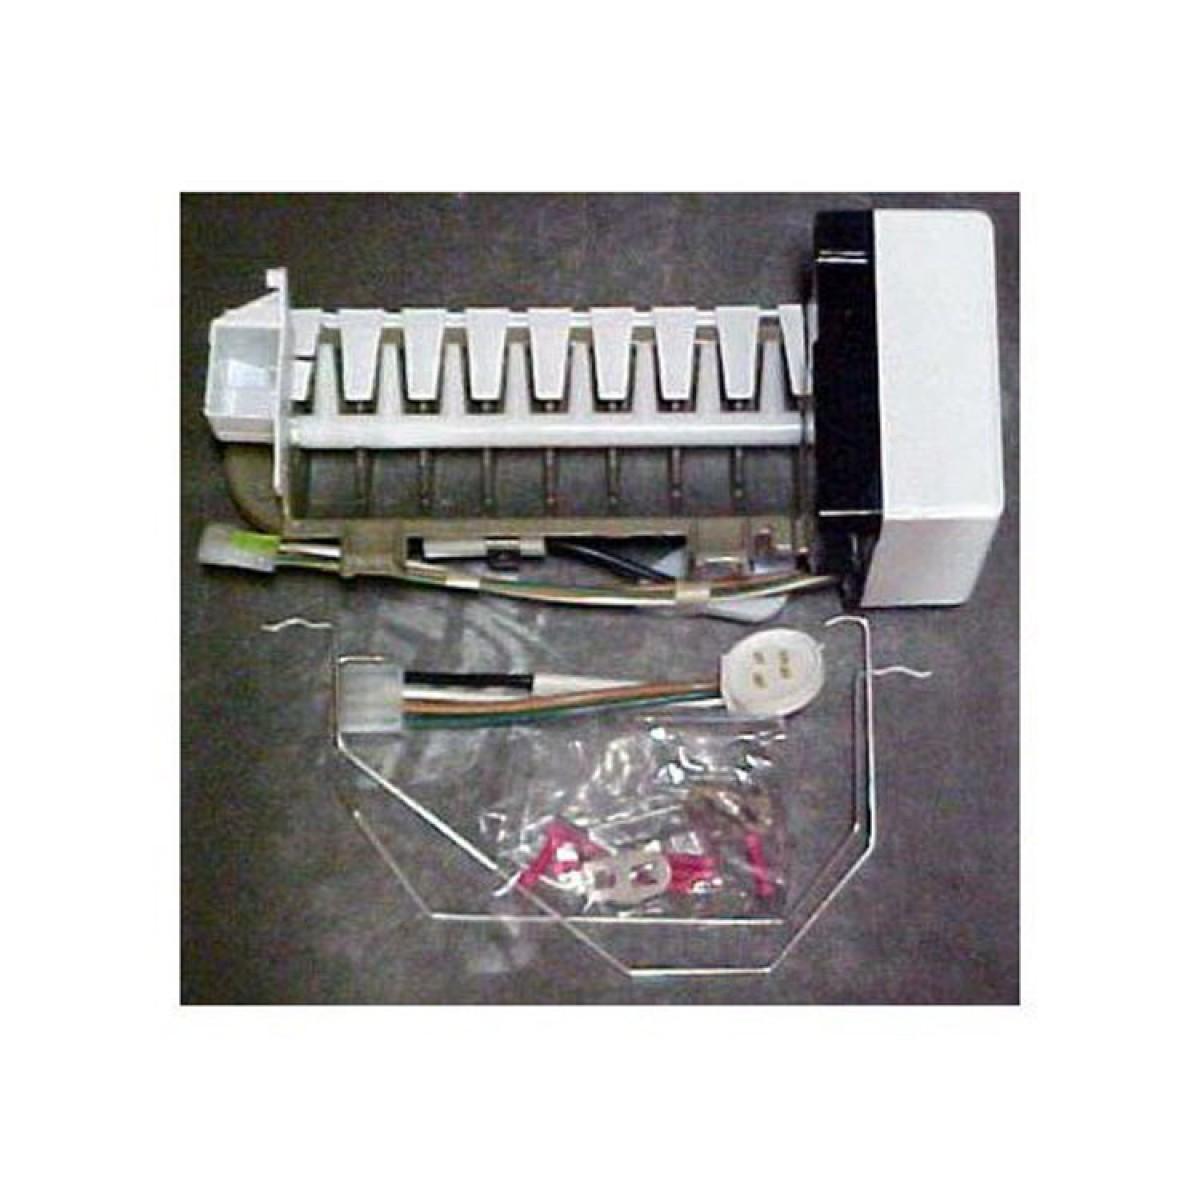 ge cafe refrigerator wiring diagram car air intake system whirlpool 4317943 ice maker